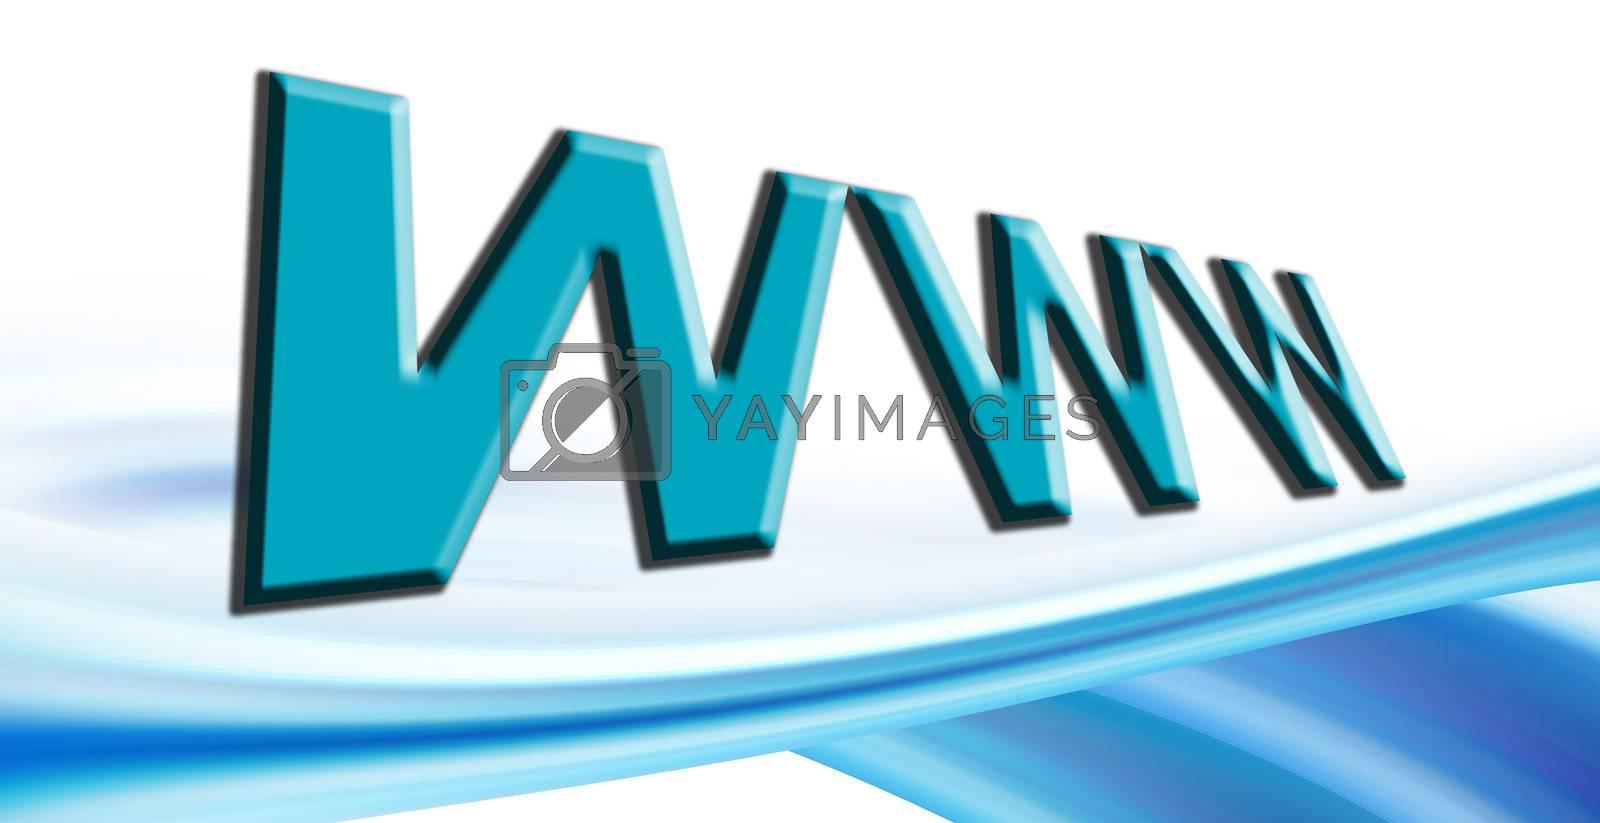 internet text on white background